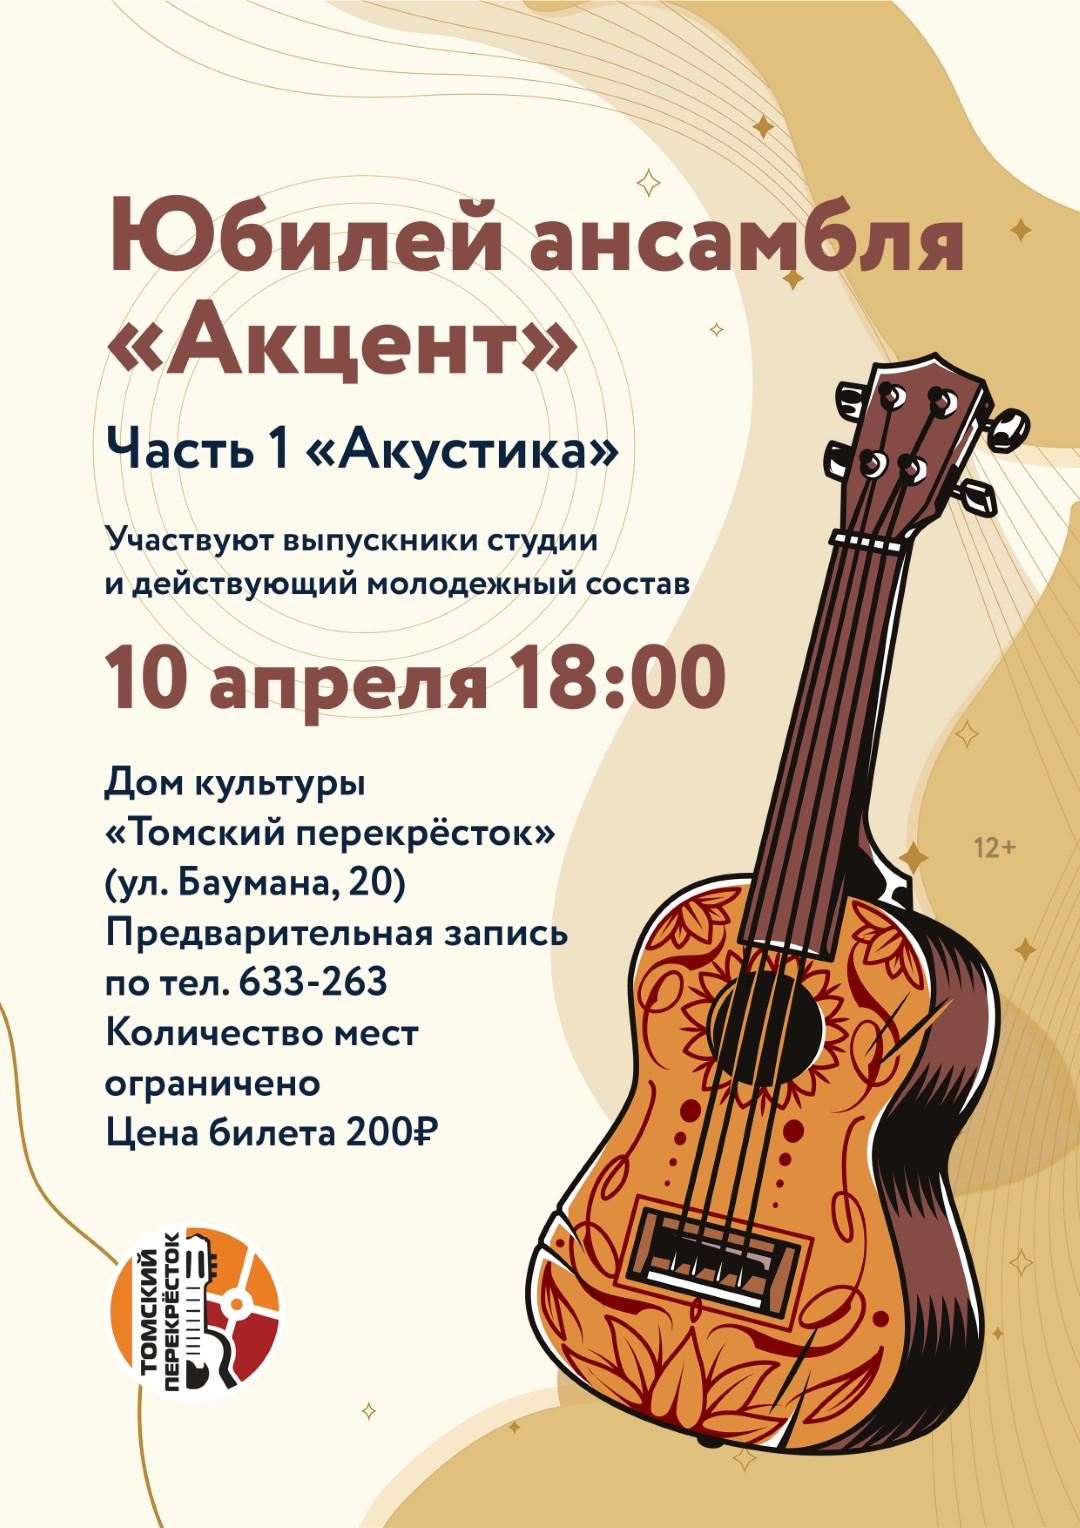 афиша юбилейного концерта Акцент